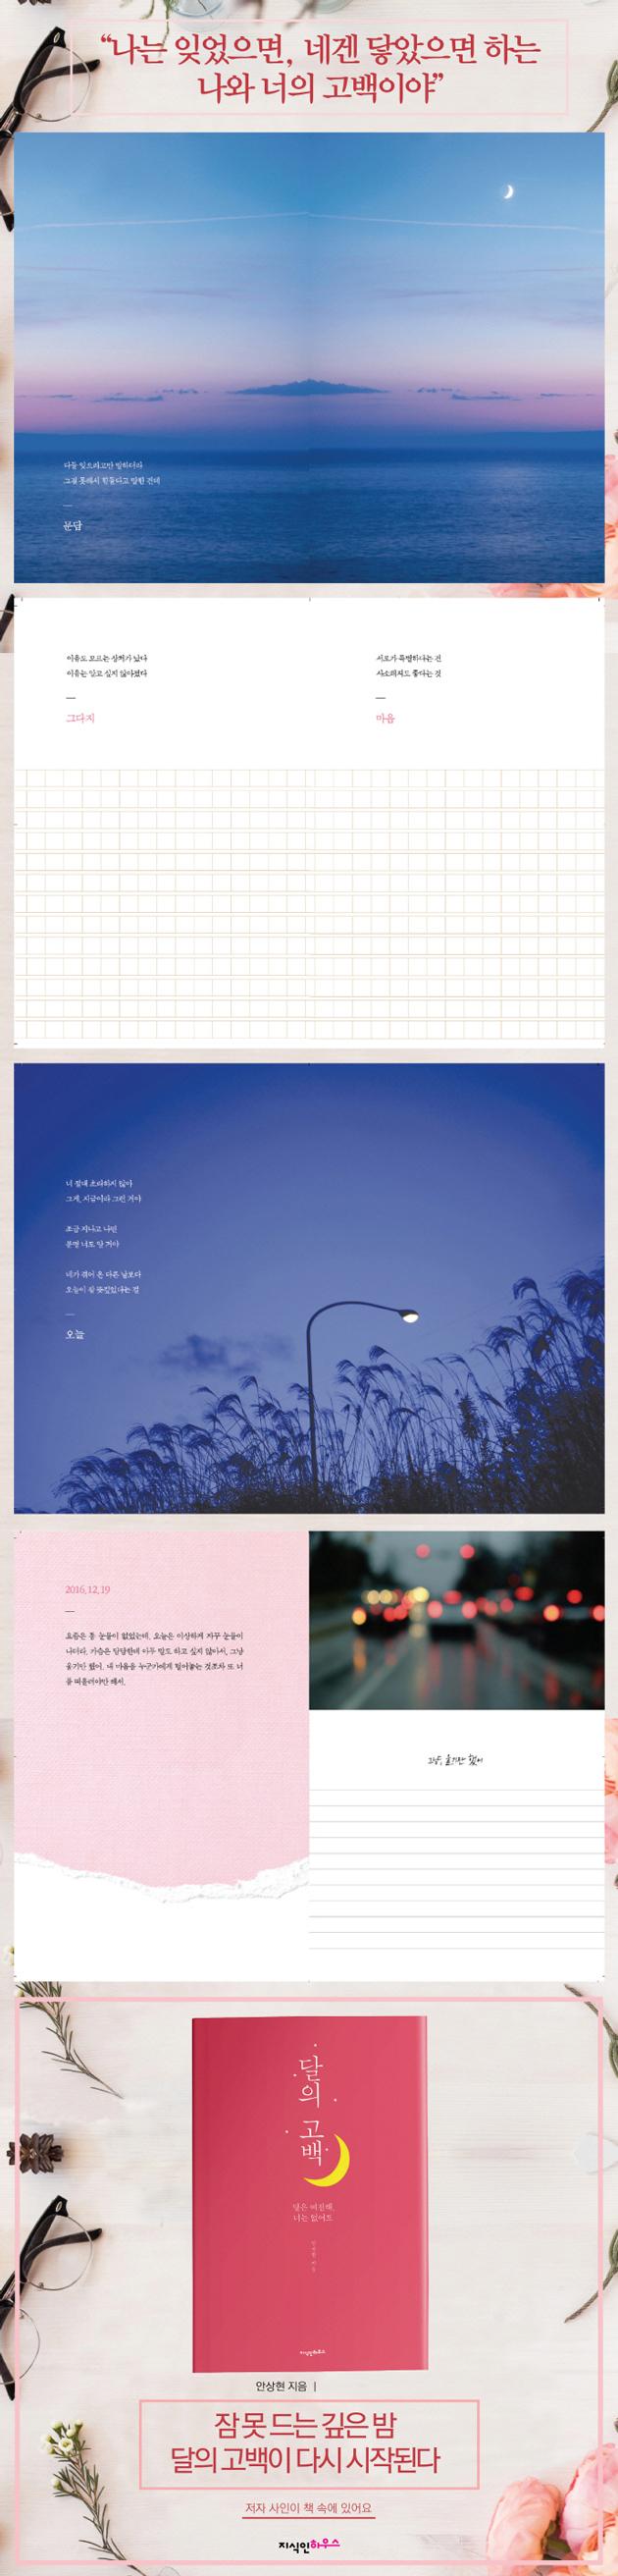 shop-online-Dosoguan-korean-poems-practice-korean-reading